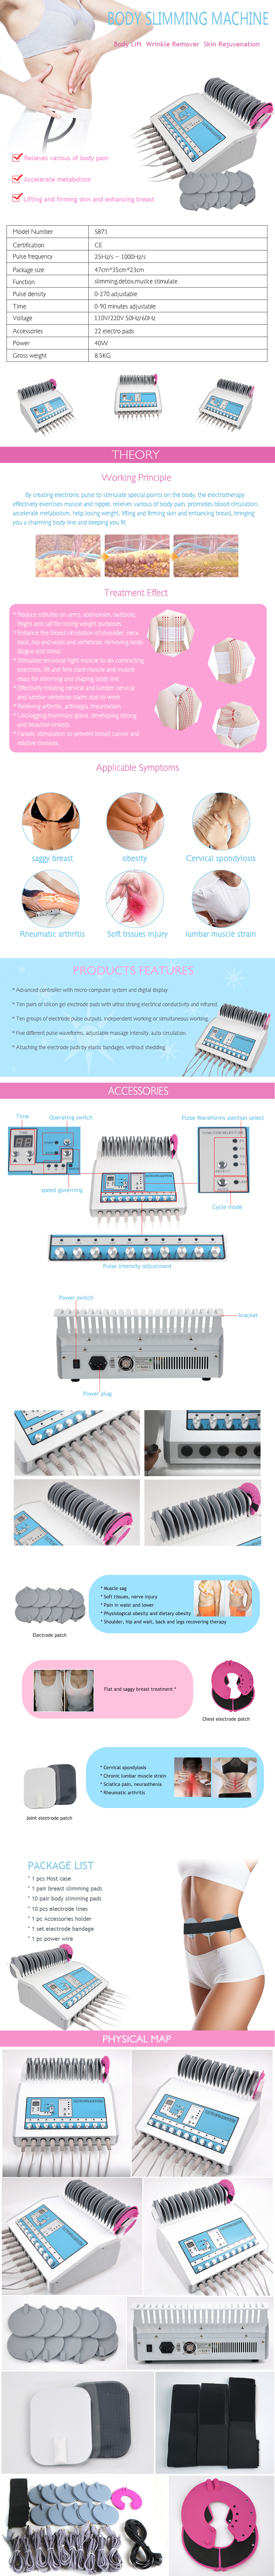 EMS Muscle Stimulation Machine product details